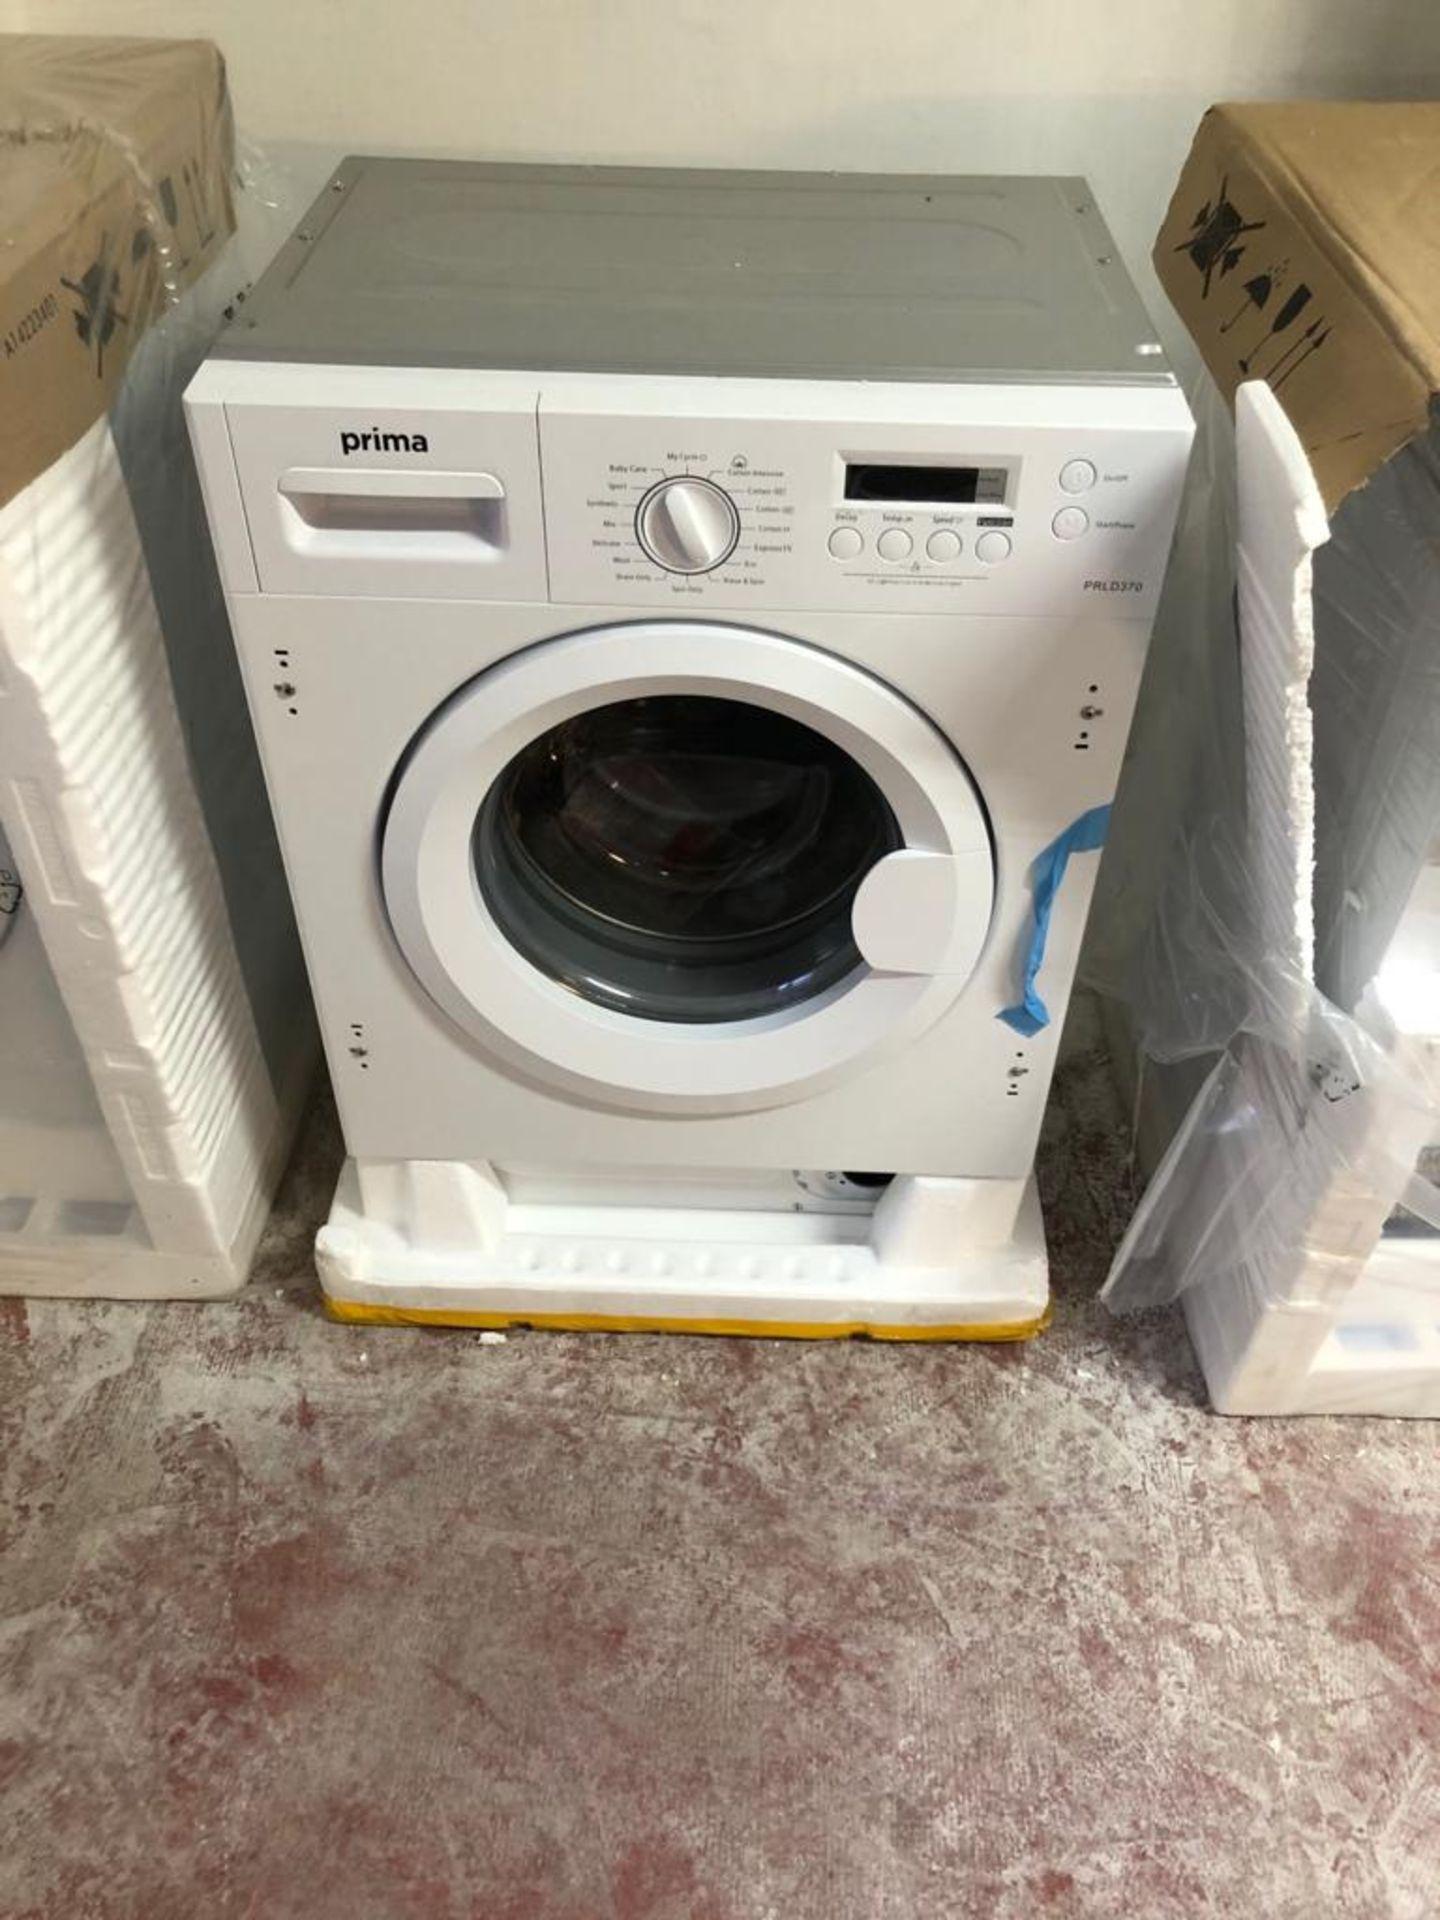 BRAND NEW UNPACKAGED Prima 7Kg Fully Integrated Washing Machine PRLD370 - White